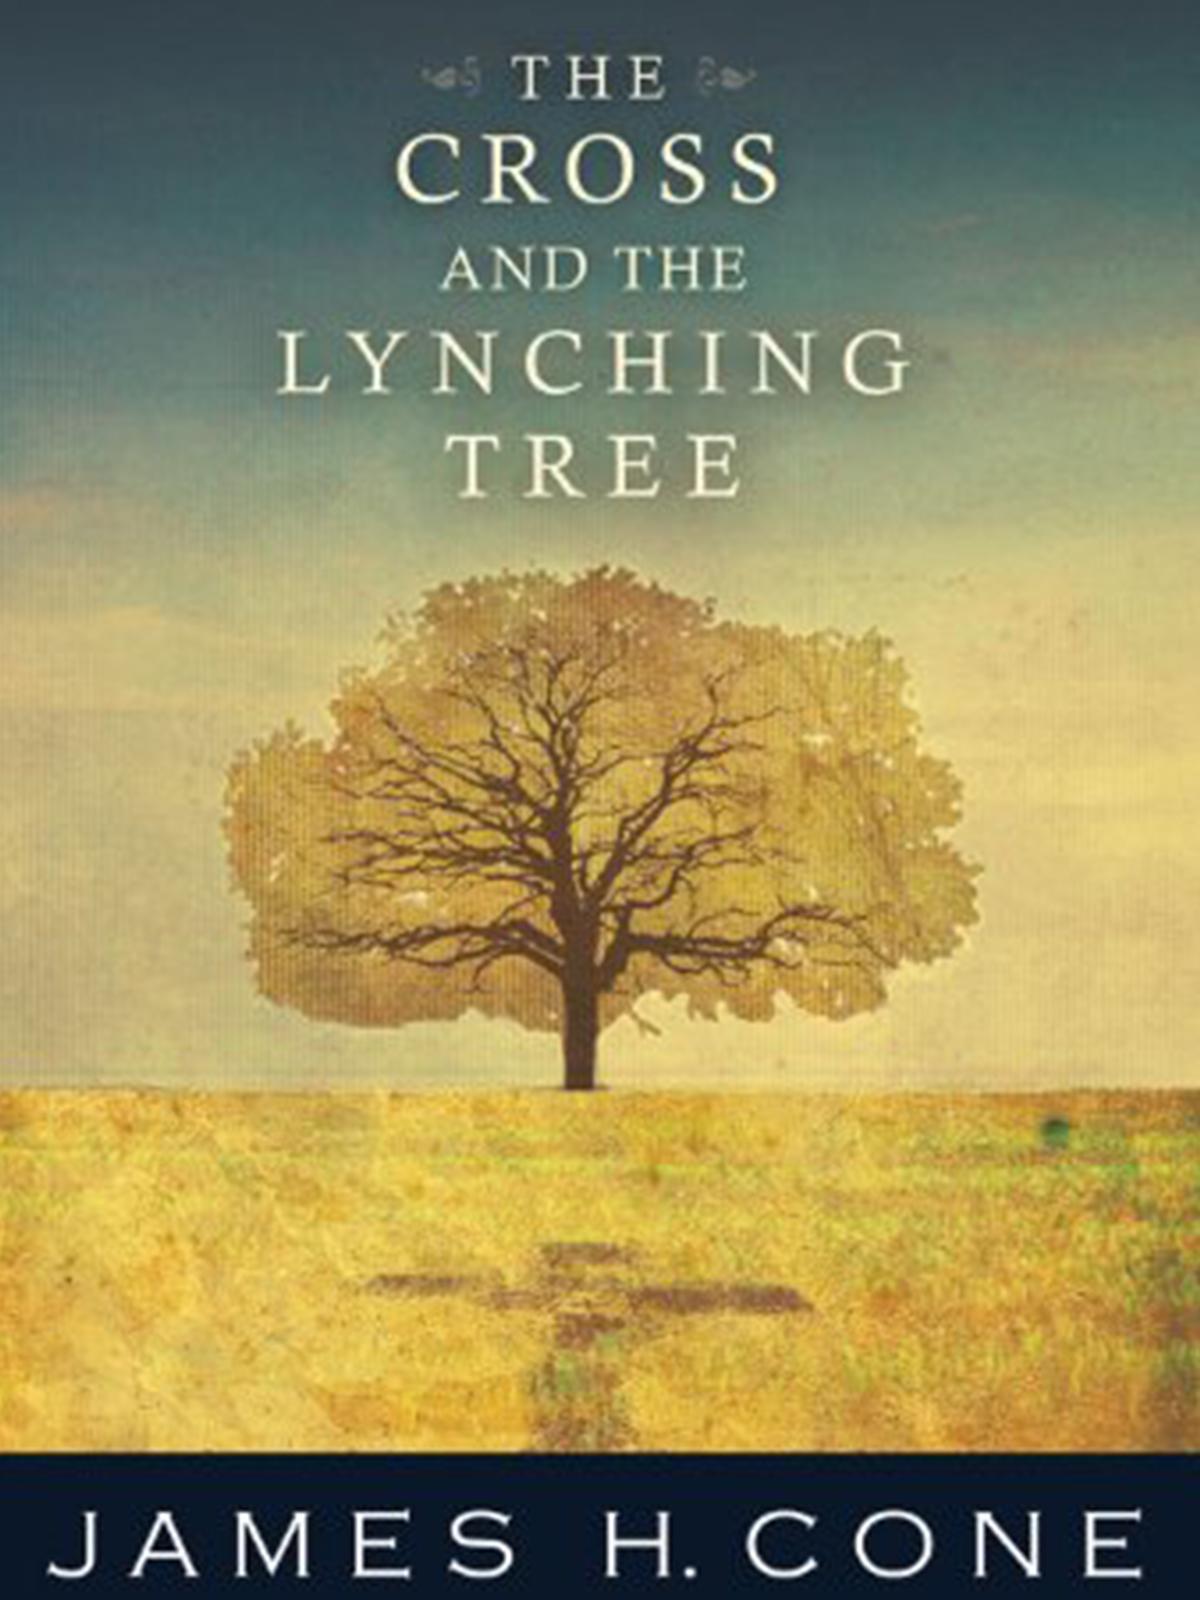 Book_Cross and Lynching Tree